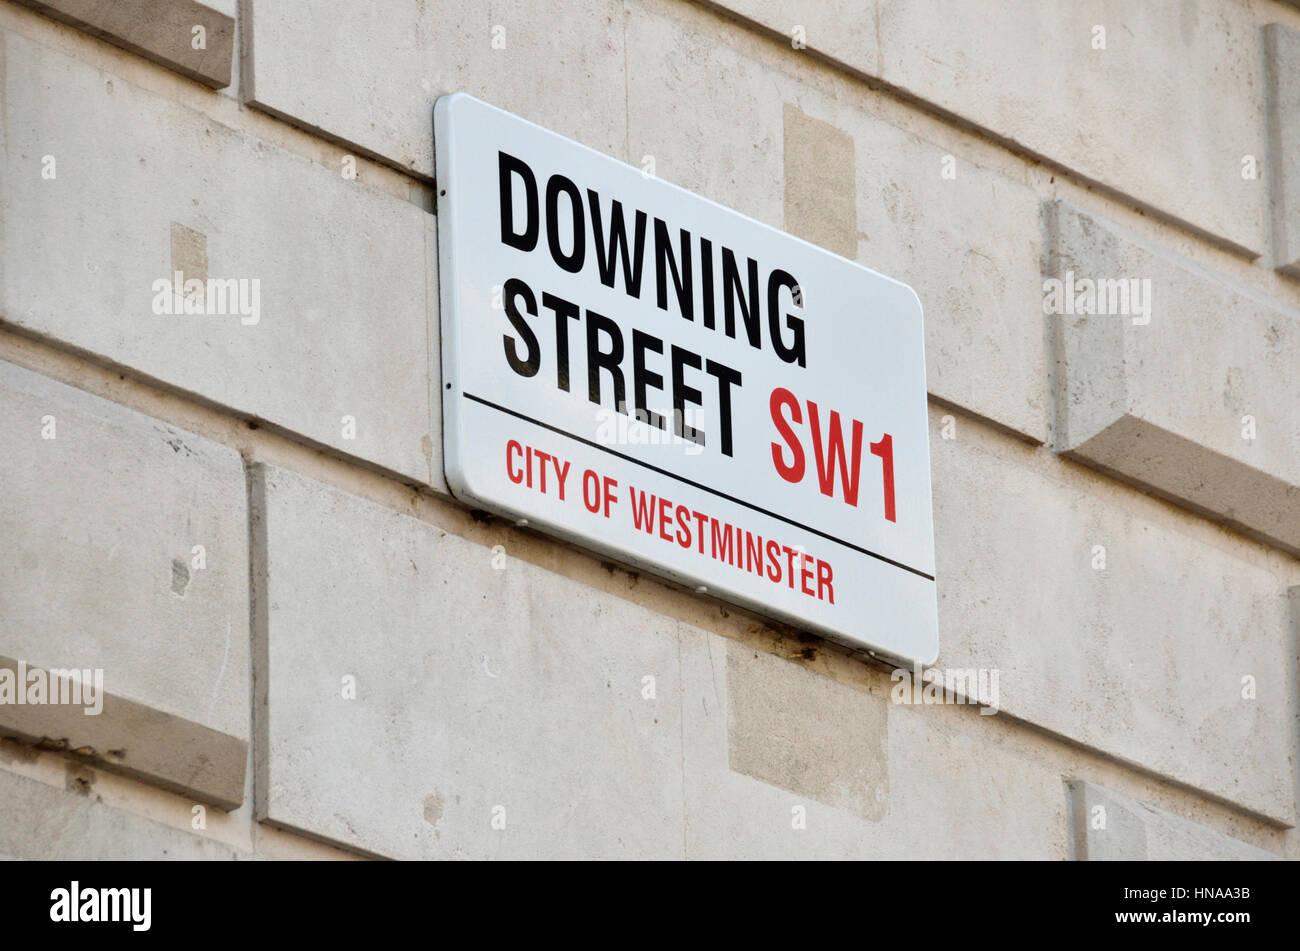 Downing Street sreet sign, London, UK. - Stock Image